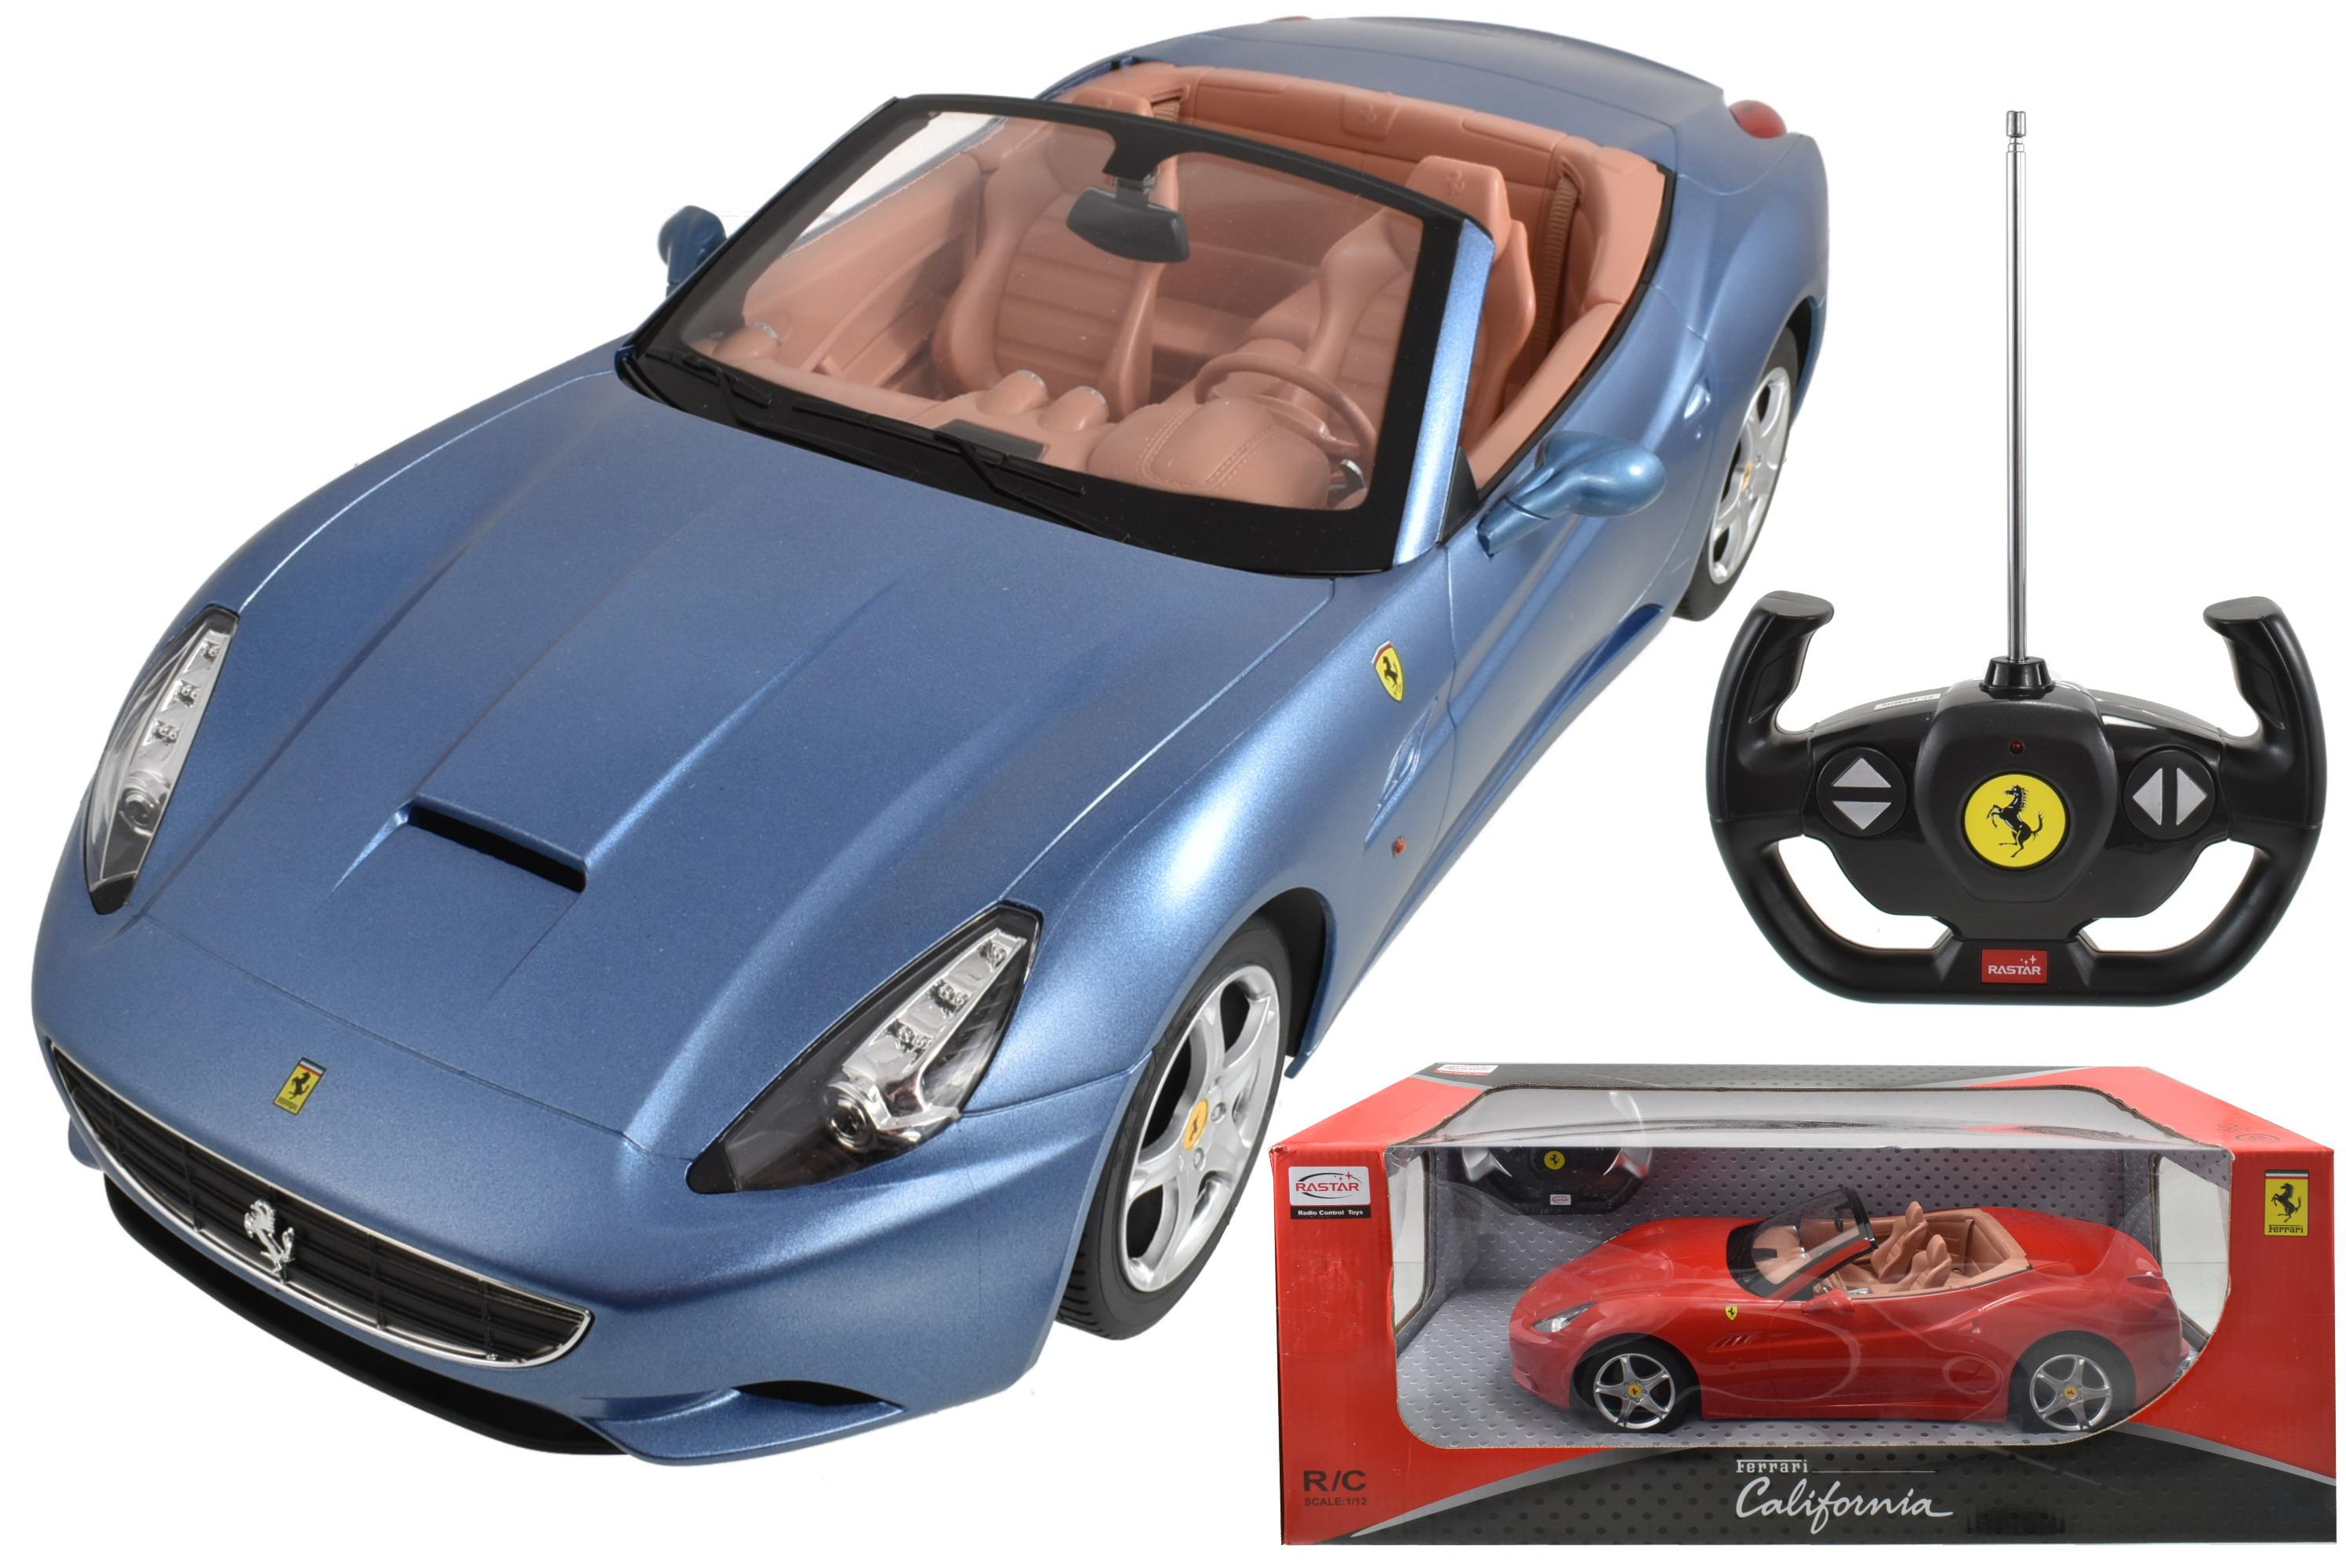 R/C Ferrari California 1:12sc (3 Assorted) In Window Bx